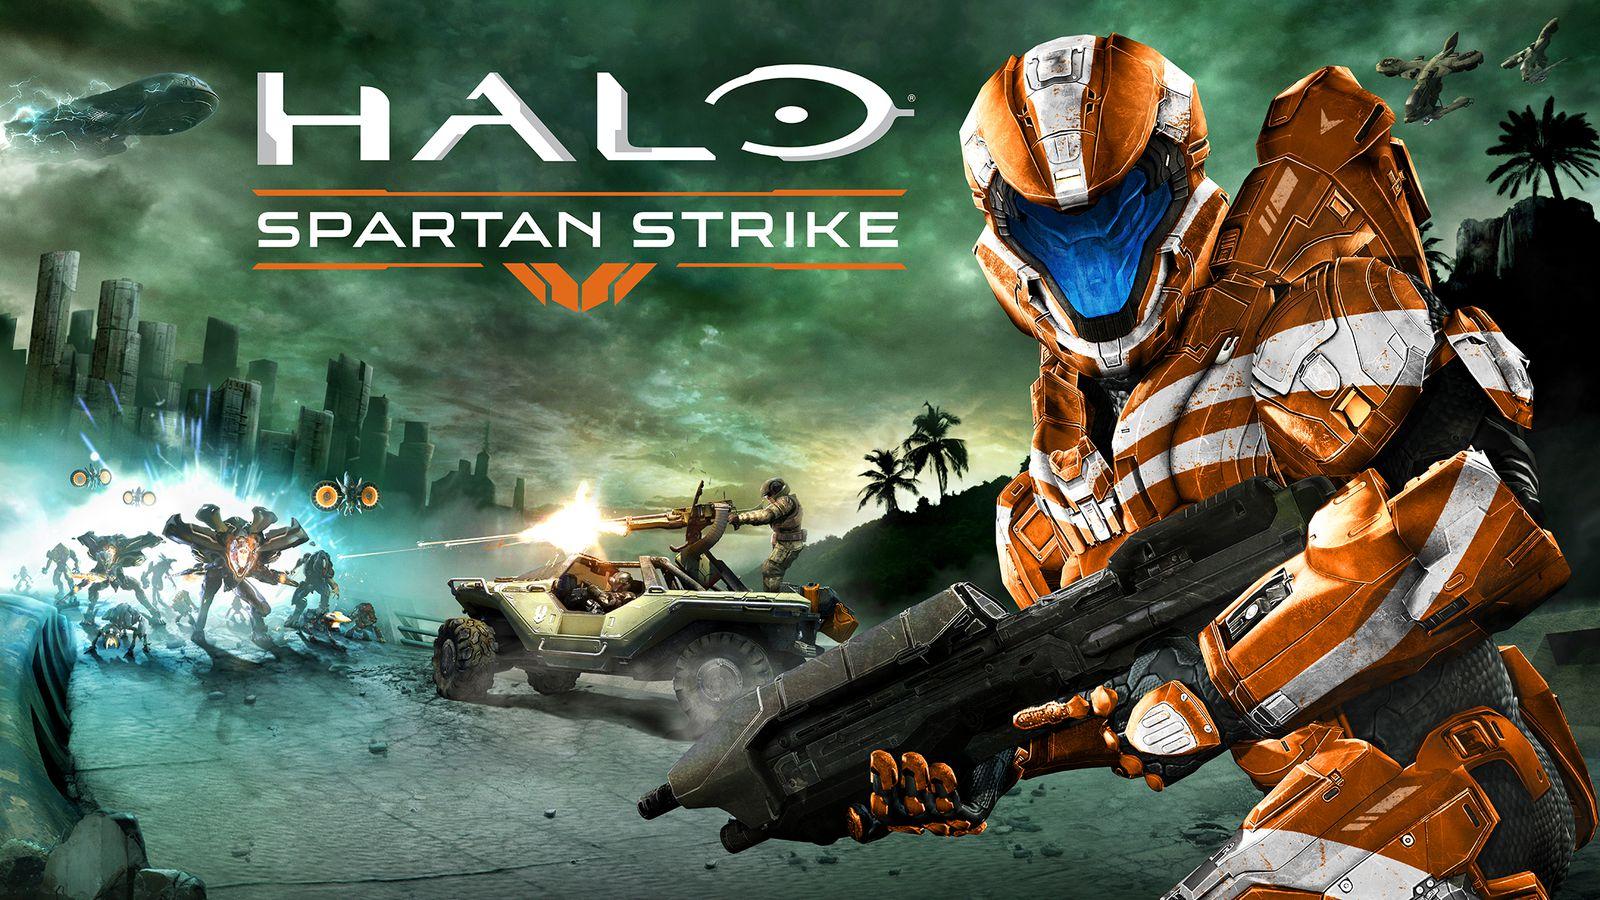 Microsoft Brings Halo Spinoffs